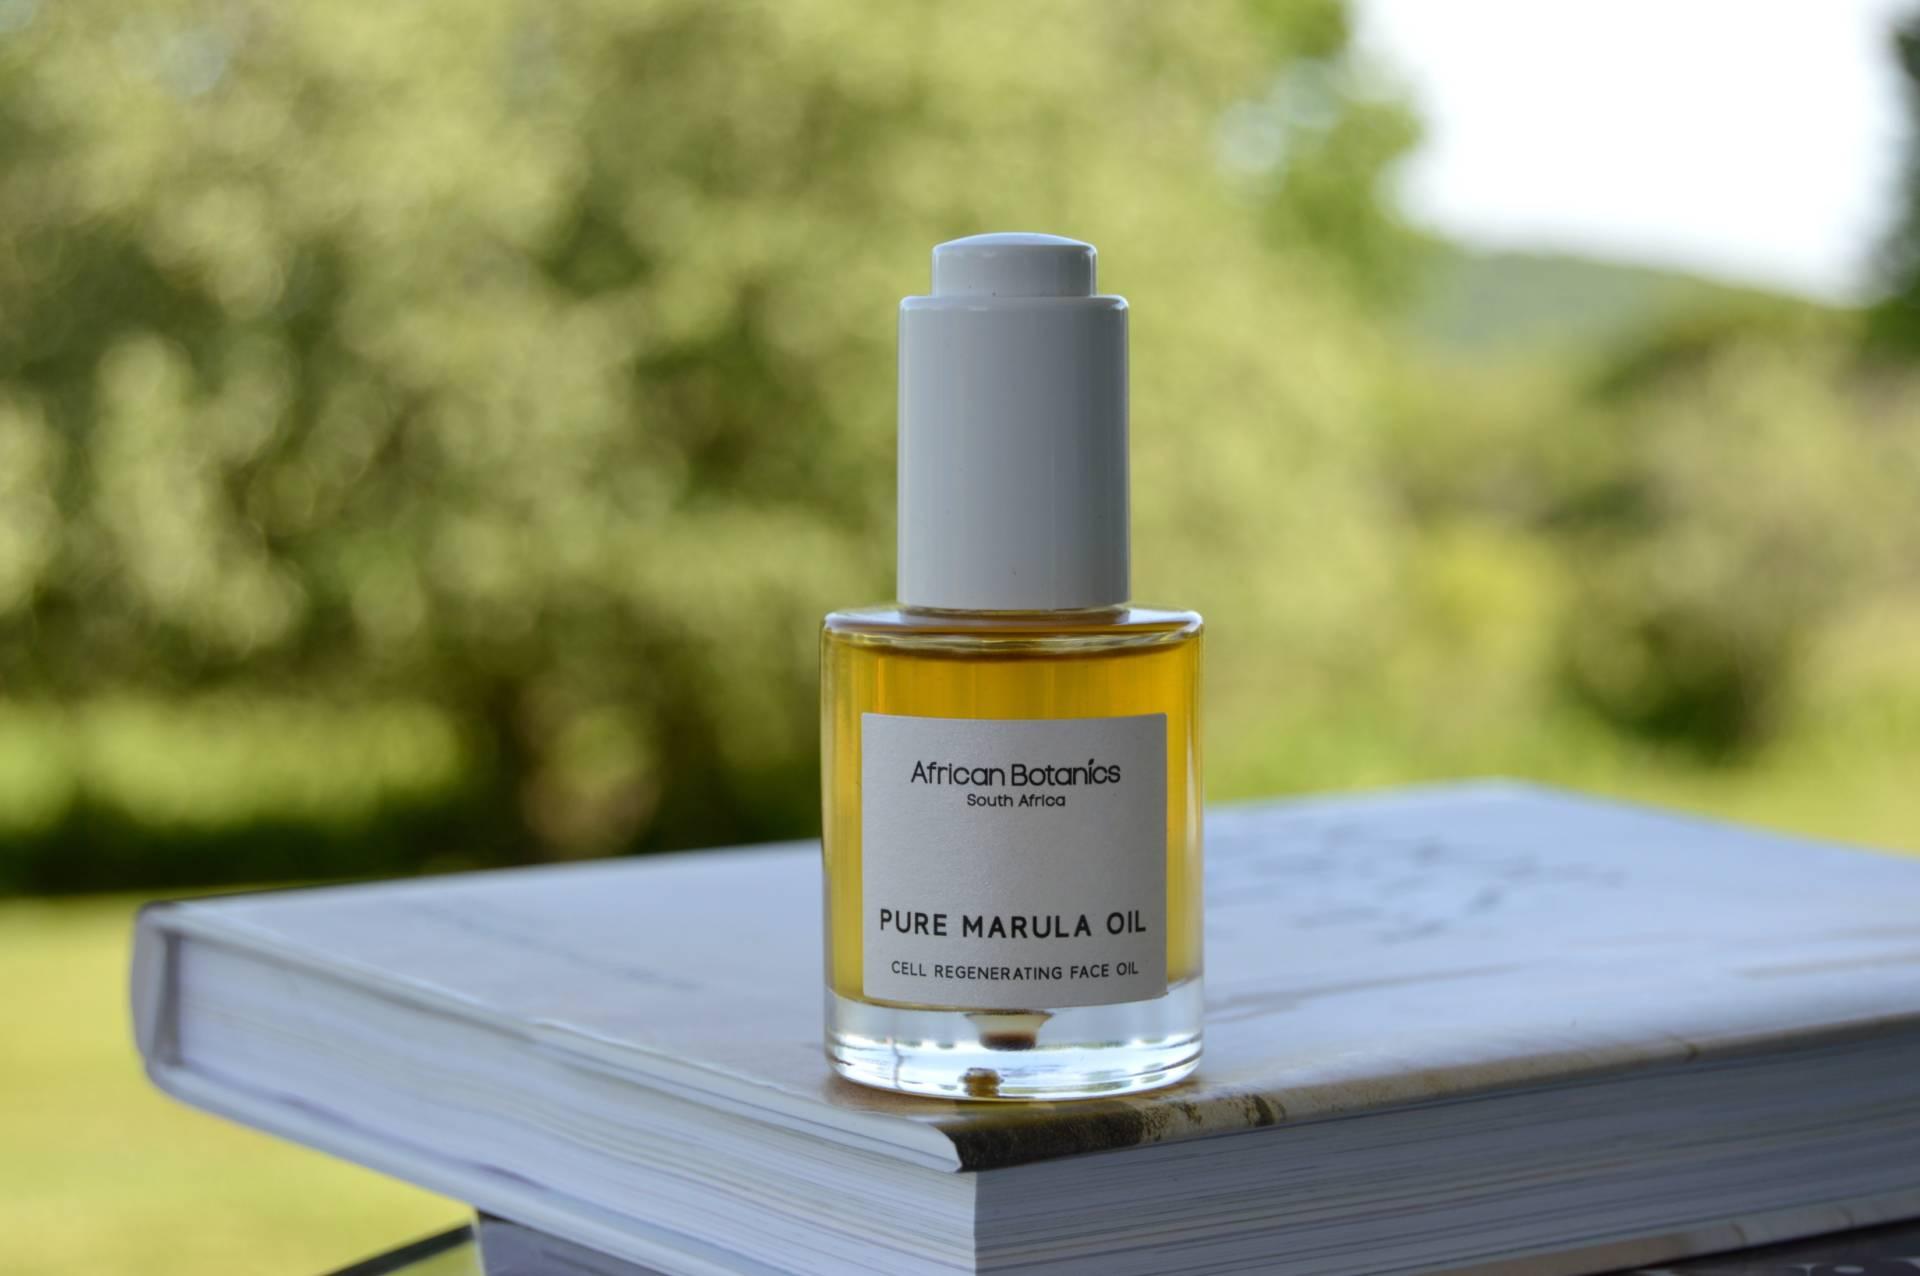 A bottle of natural oil